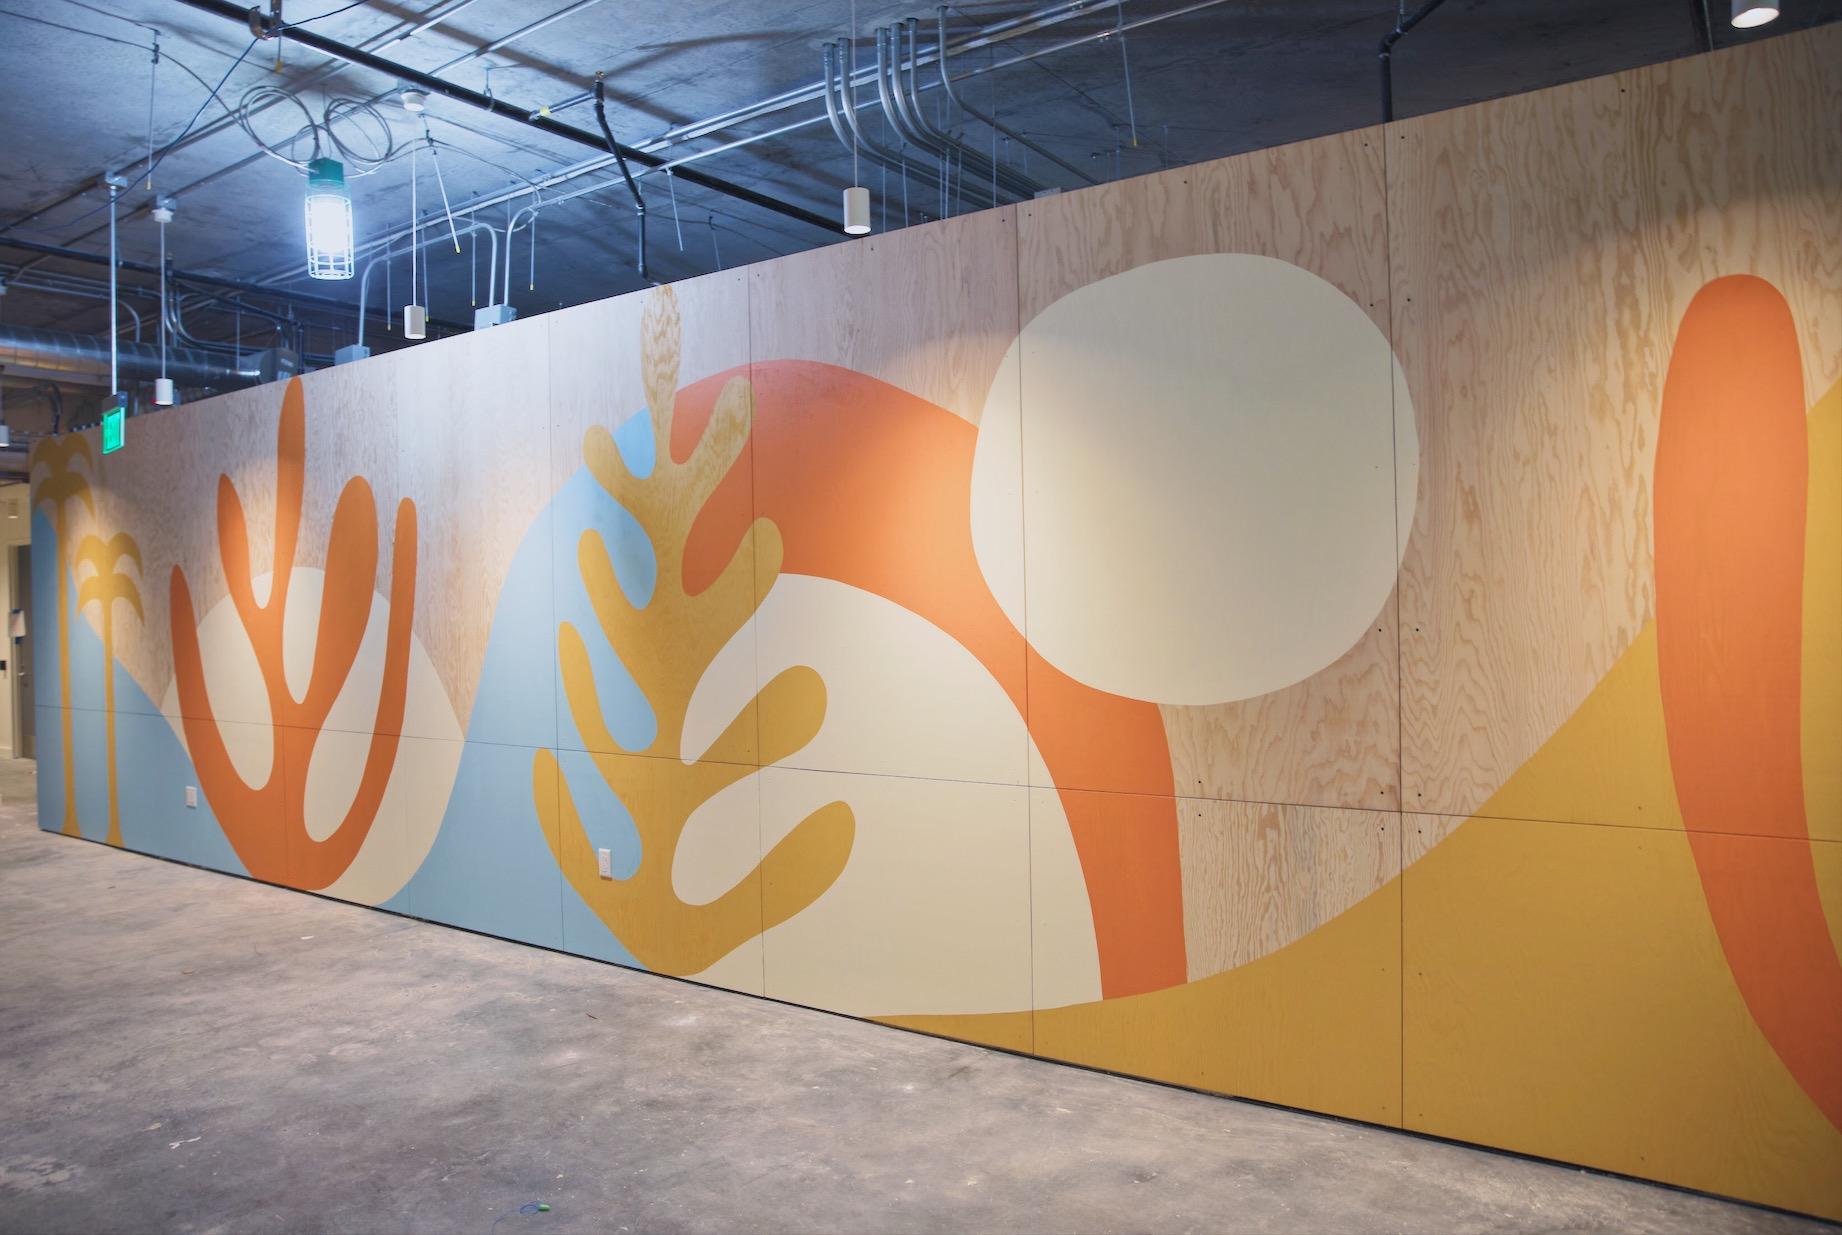 honeyandrust_project_facebook-mural-01_03.jpg